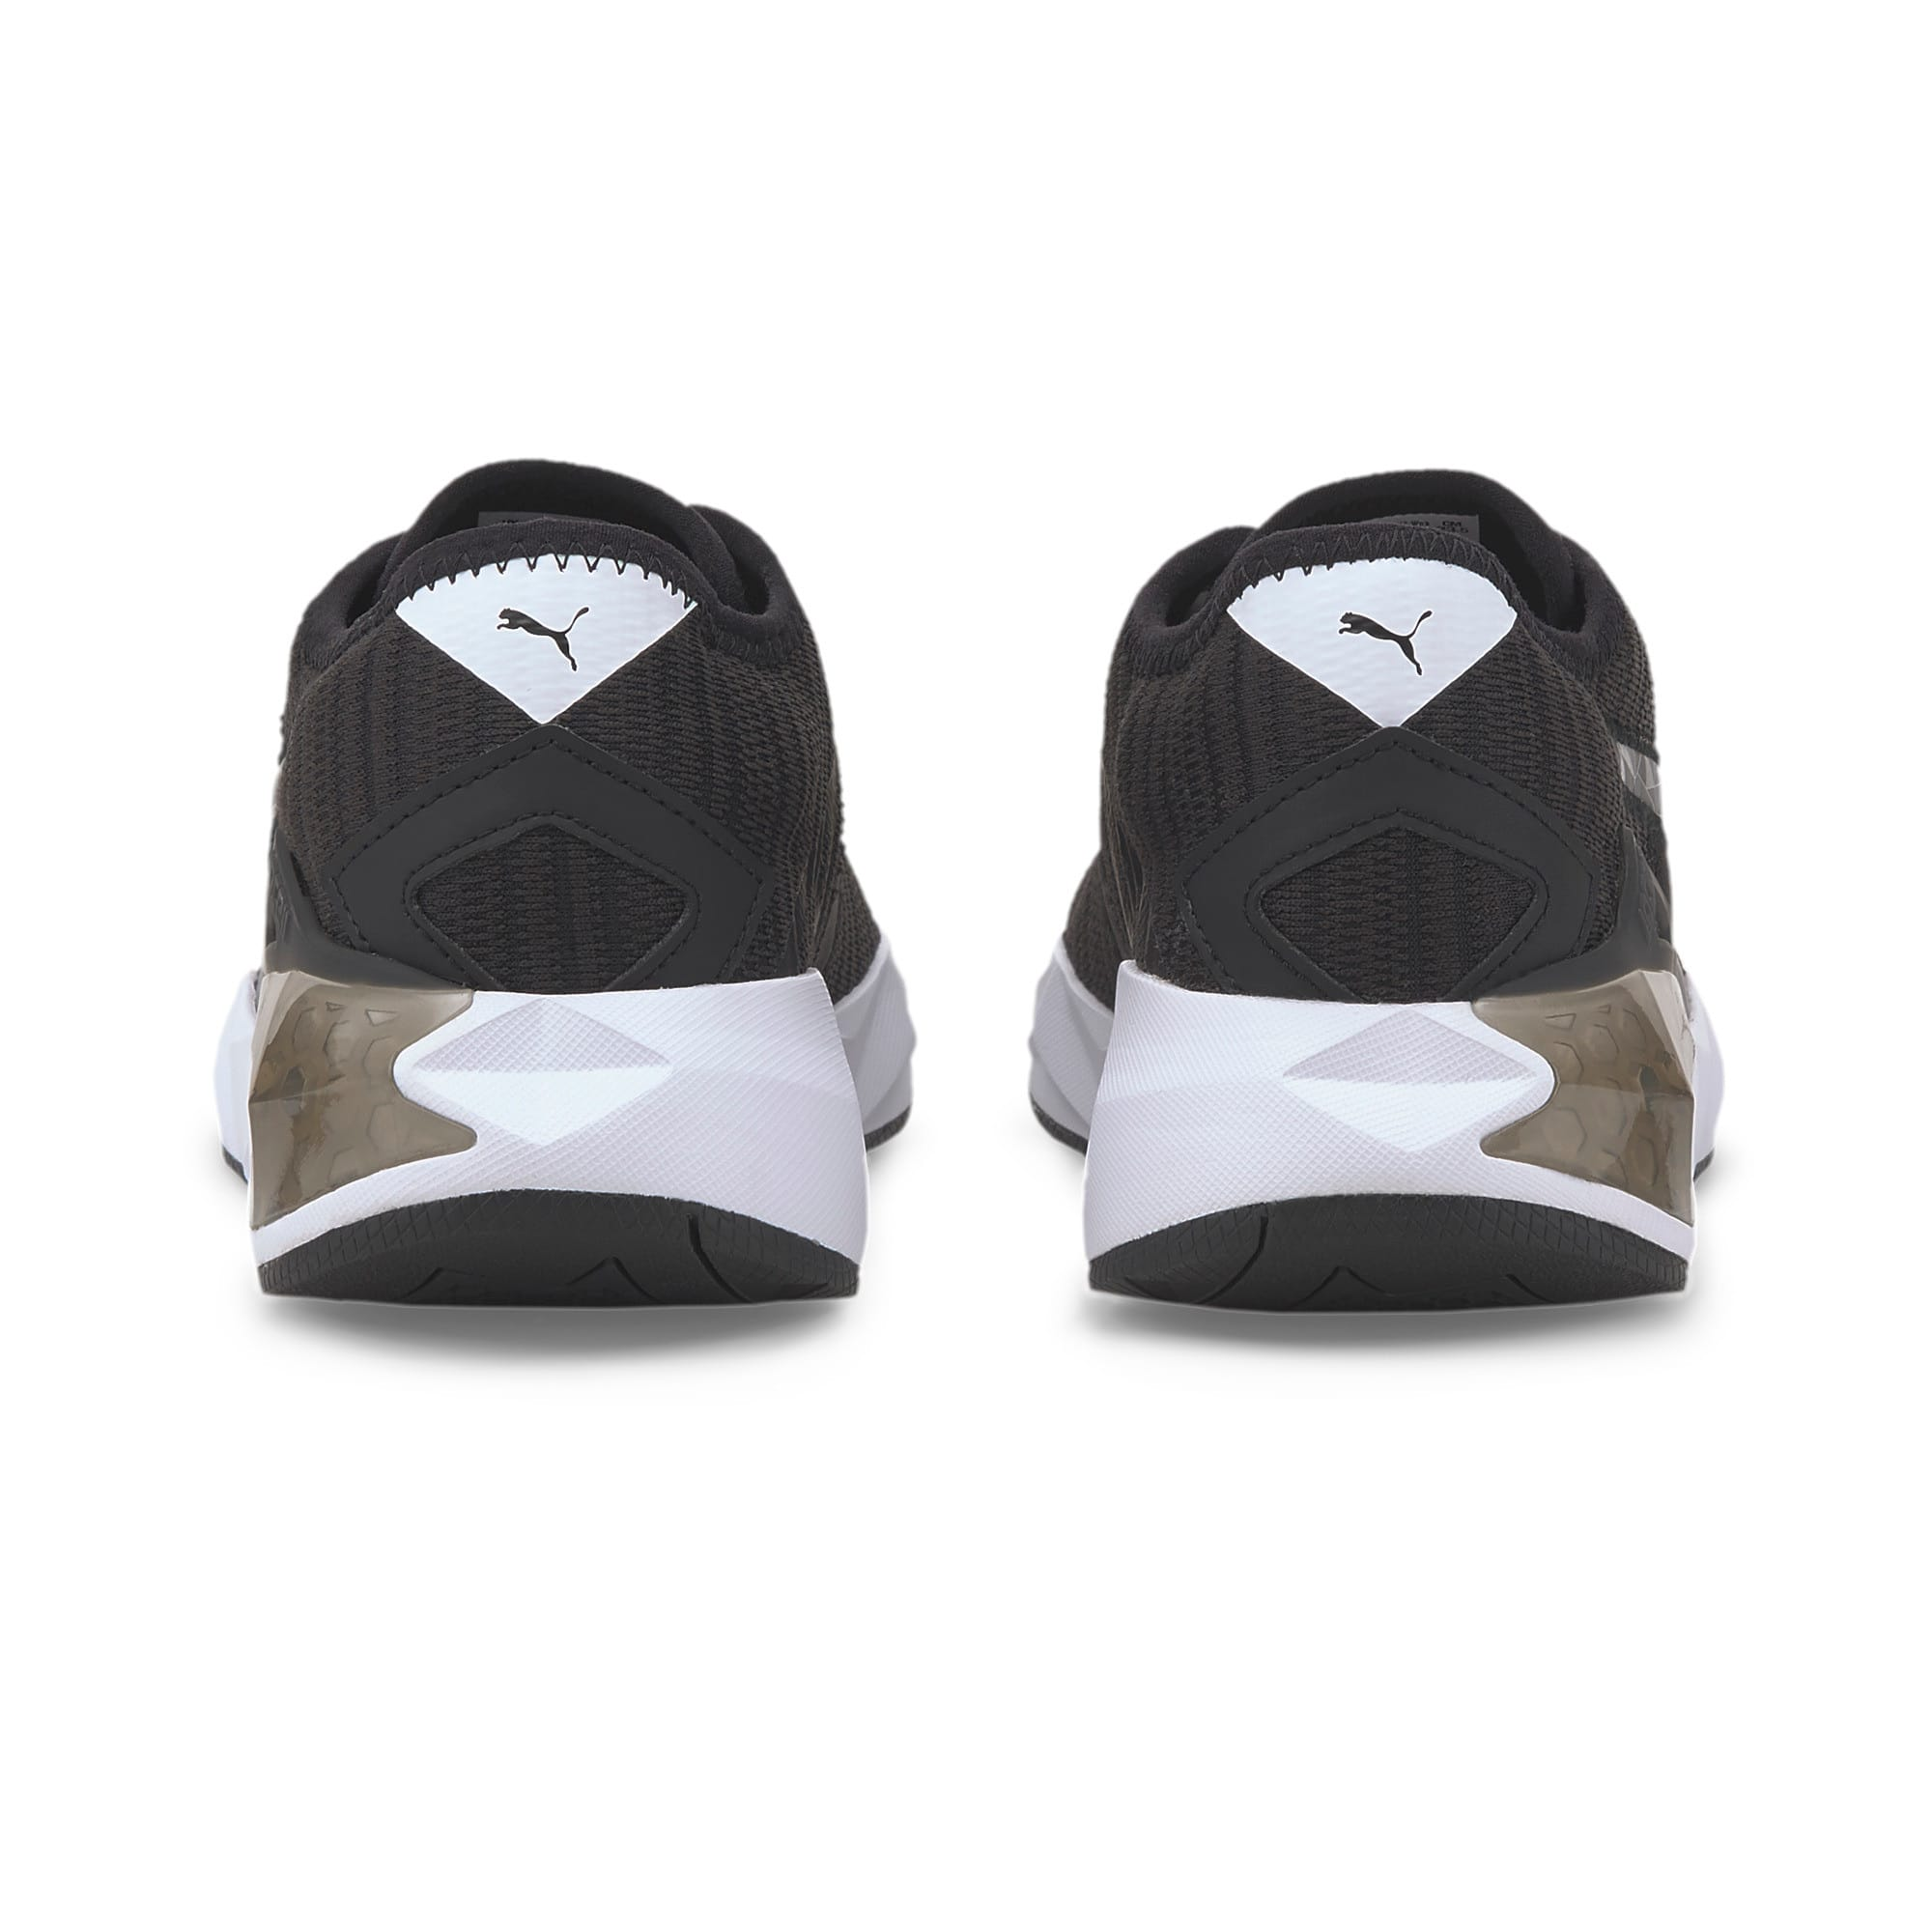 Imagen en miniatura 4 de Zapatillass de mujer CELL Plasmic, Puma Black-Puma White, mediana